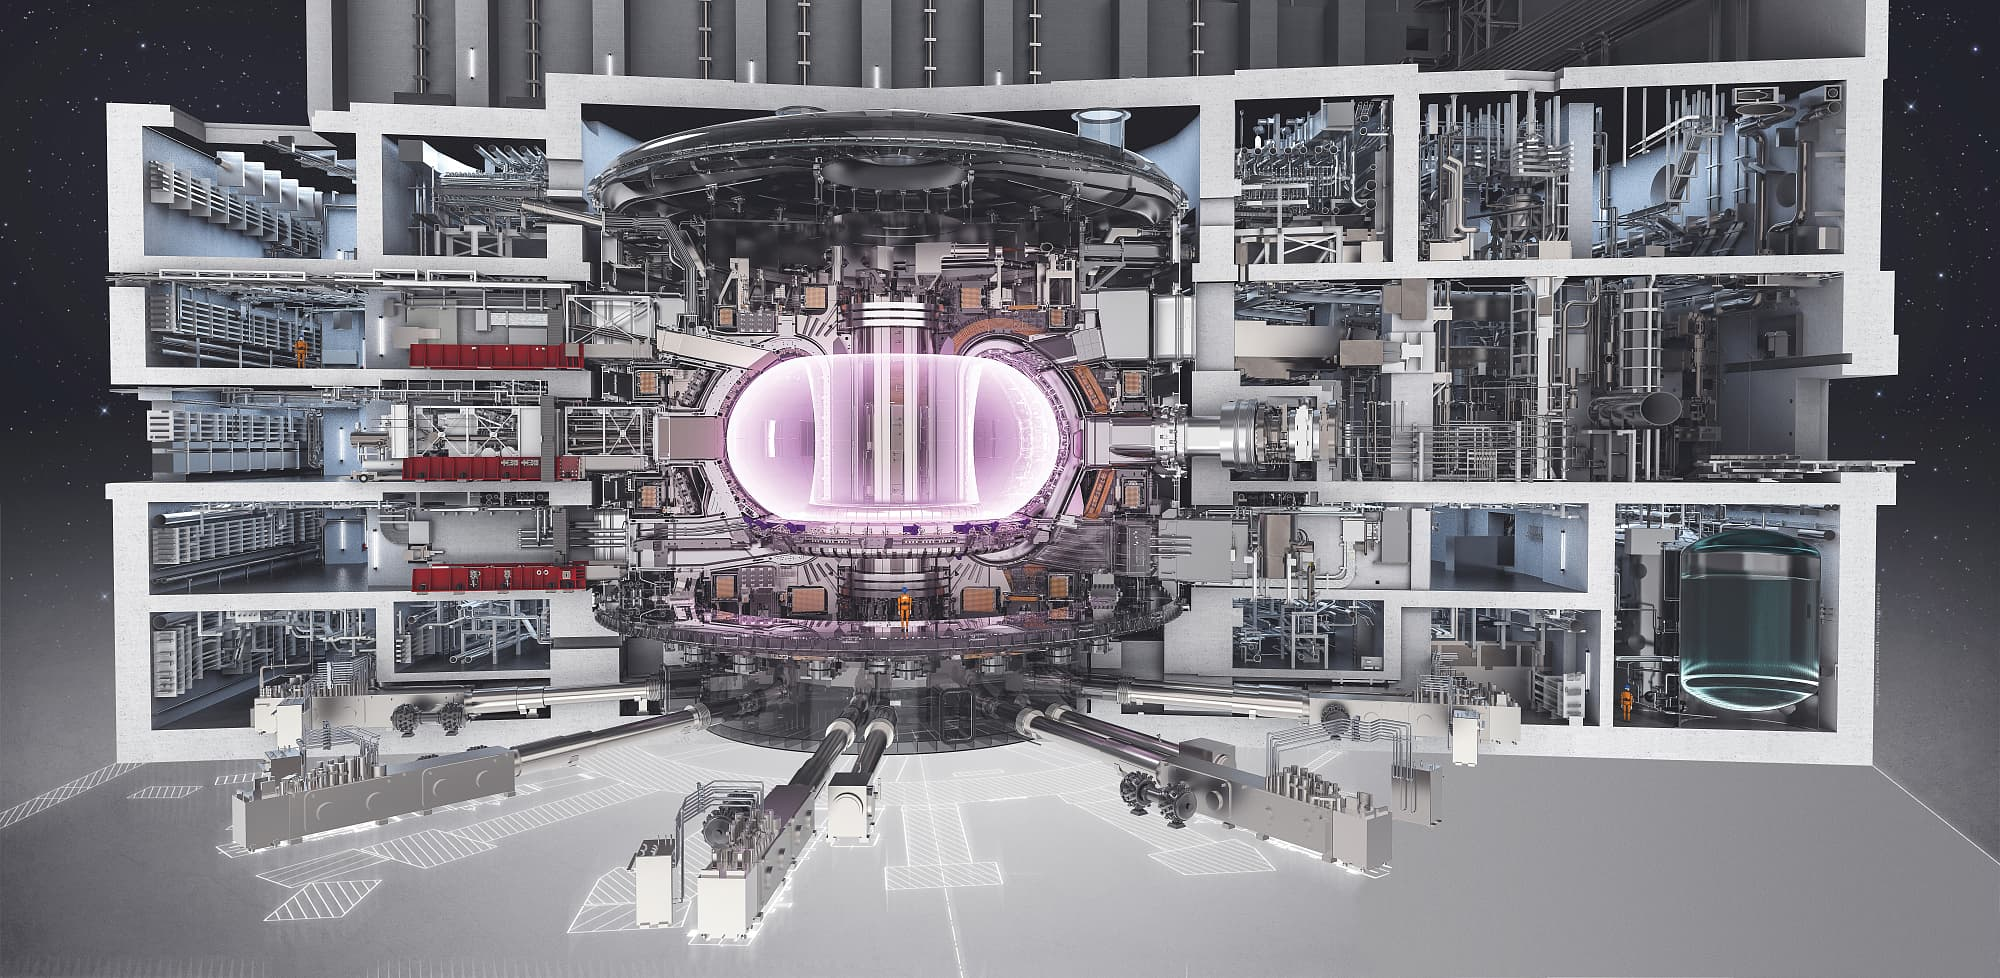 Kernfusionsreaktor Iter